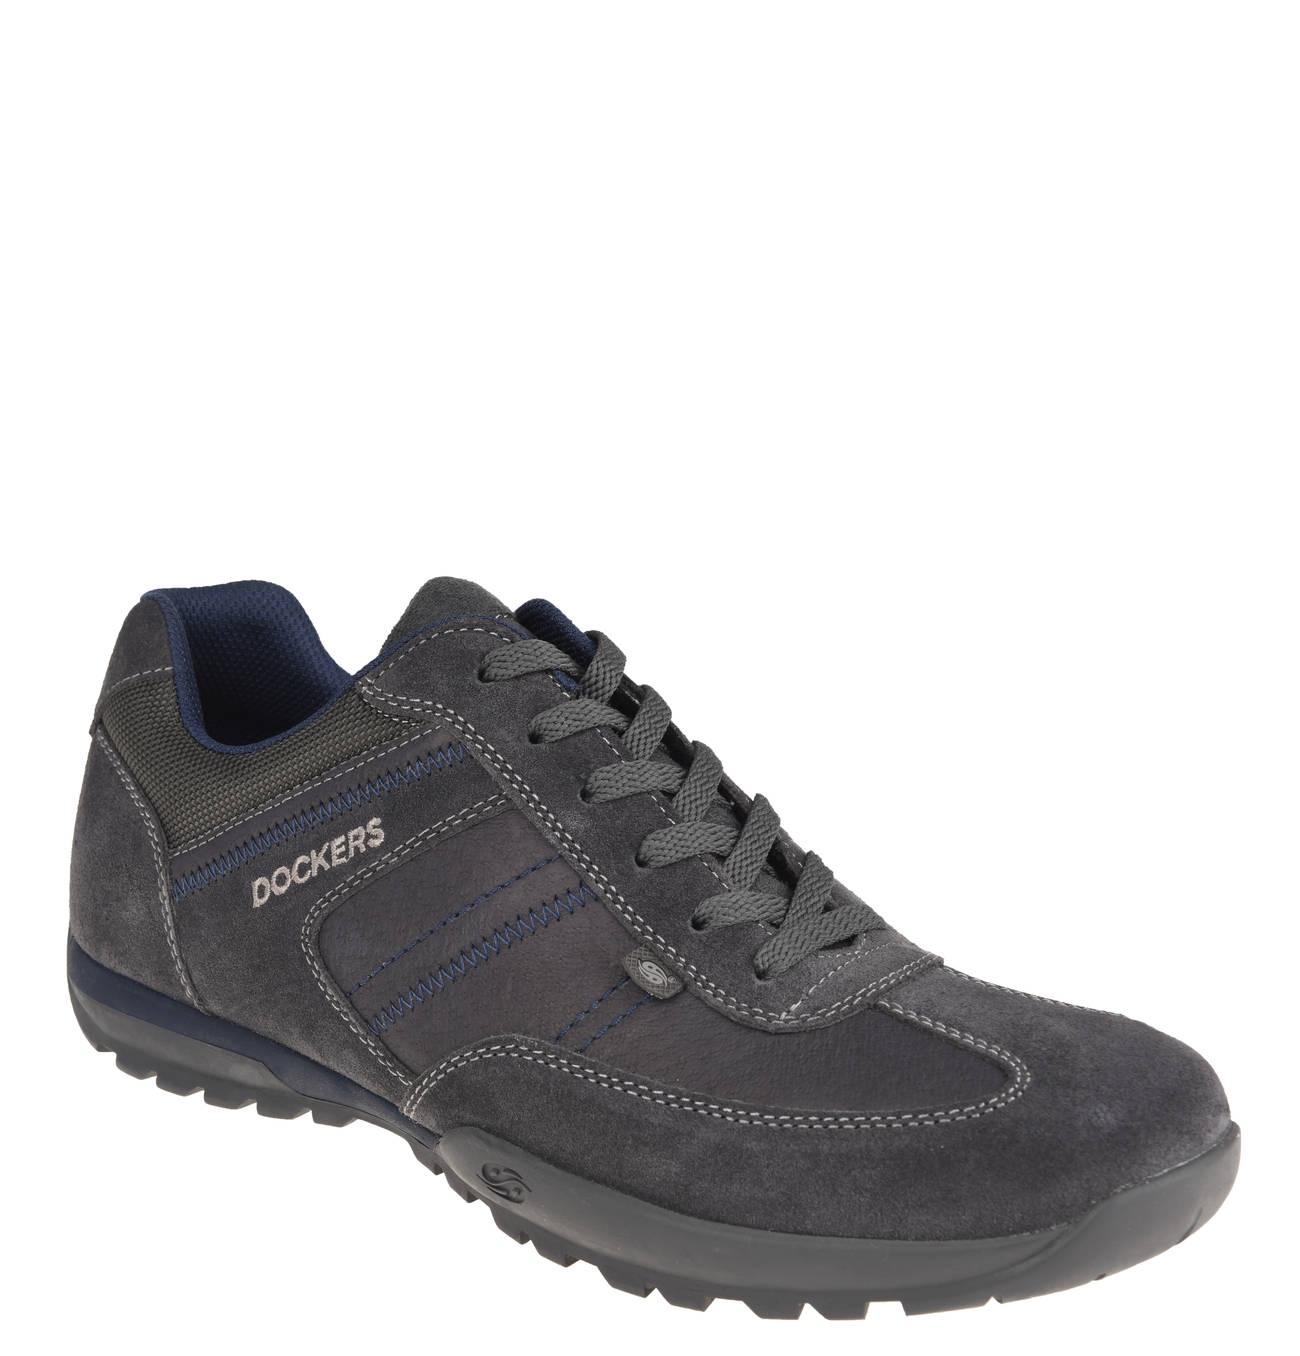 Shoes Sneakers Shoes Asphalt | eBay